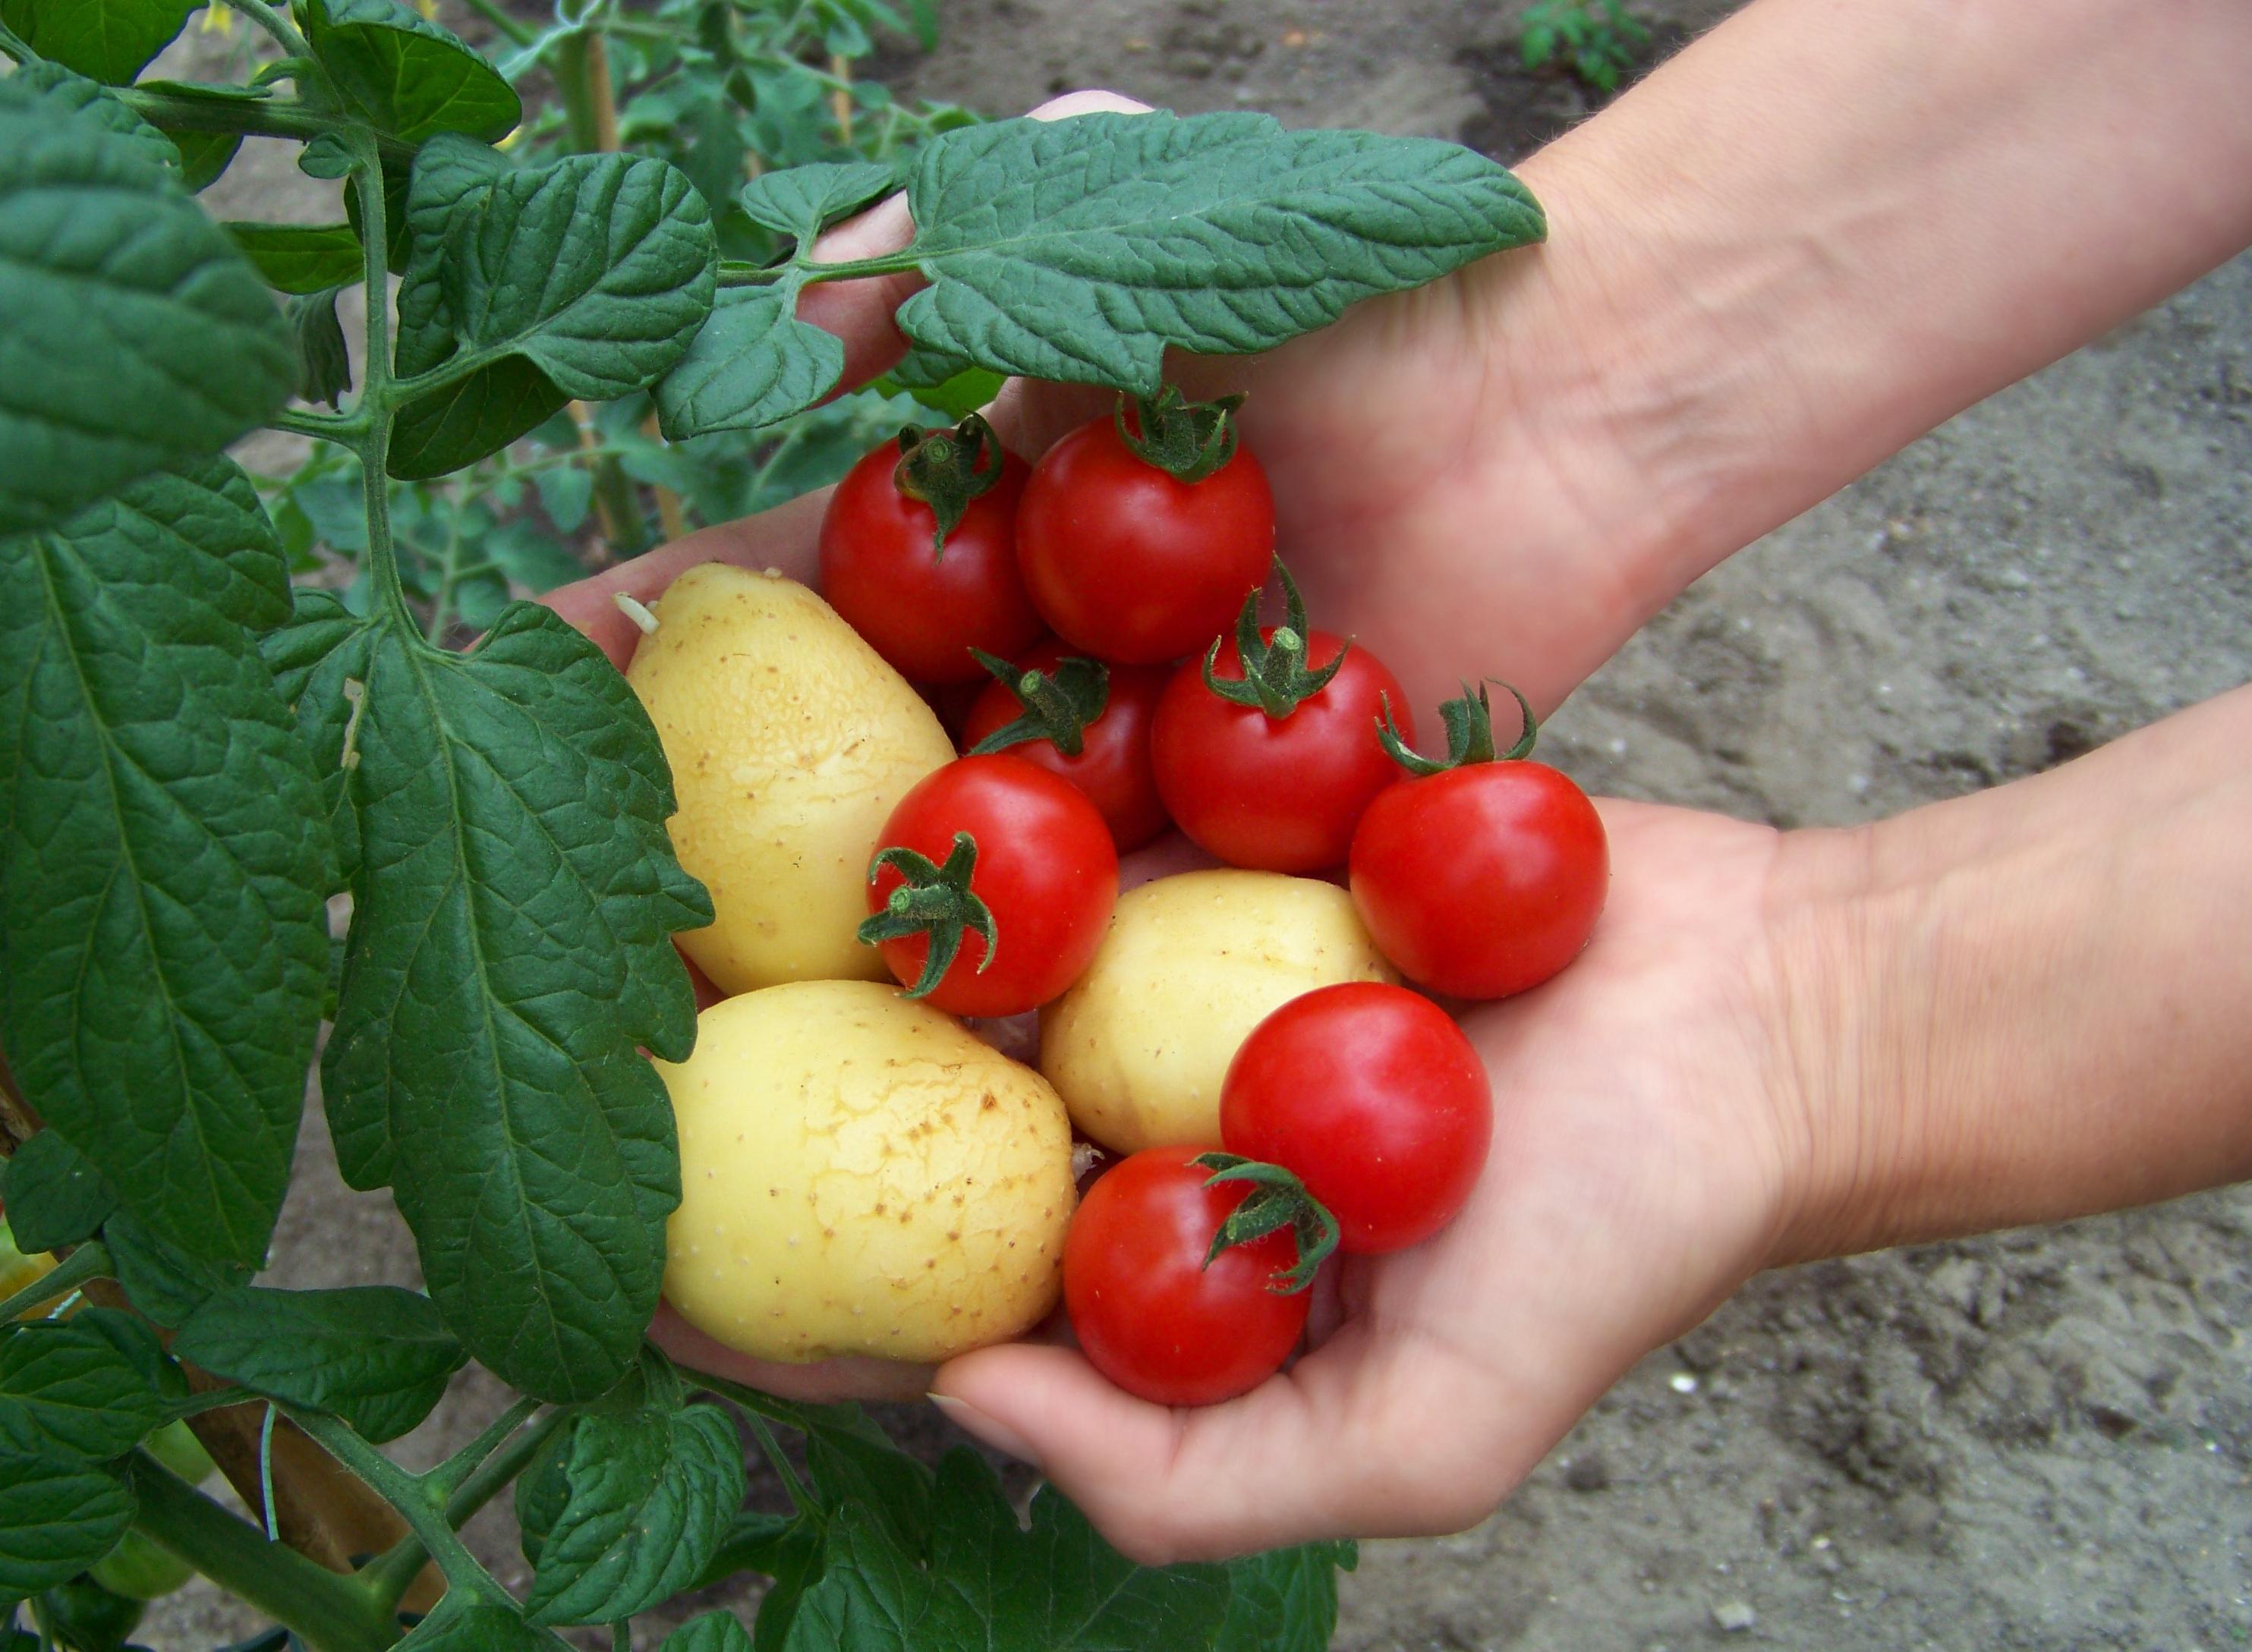 Gardener's Twofer: First Ketchup 'N' Fries Plant Hits U.S. Market